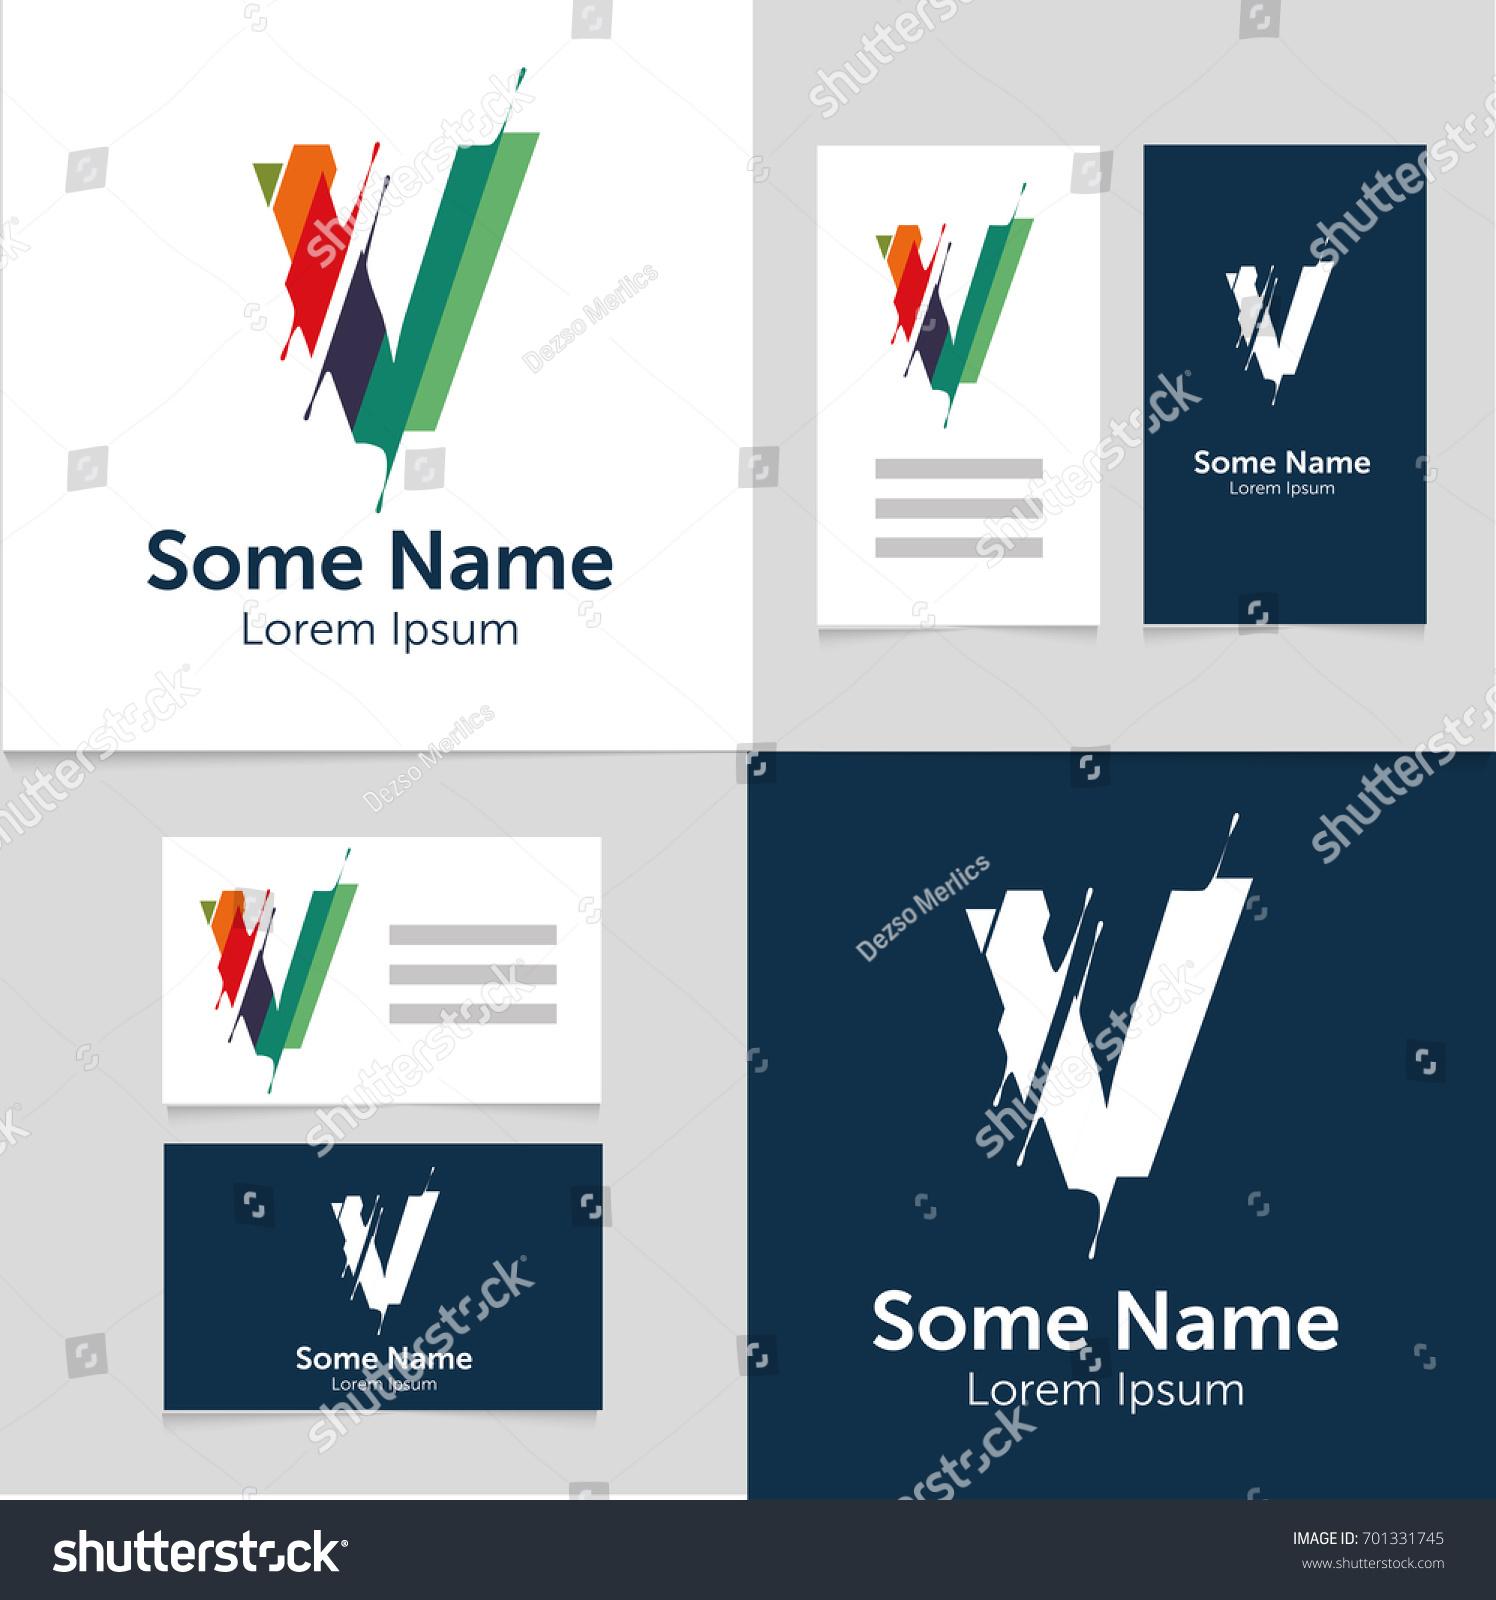 Editable Business Card Template V Letter Stock Vector 701331745 ...